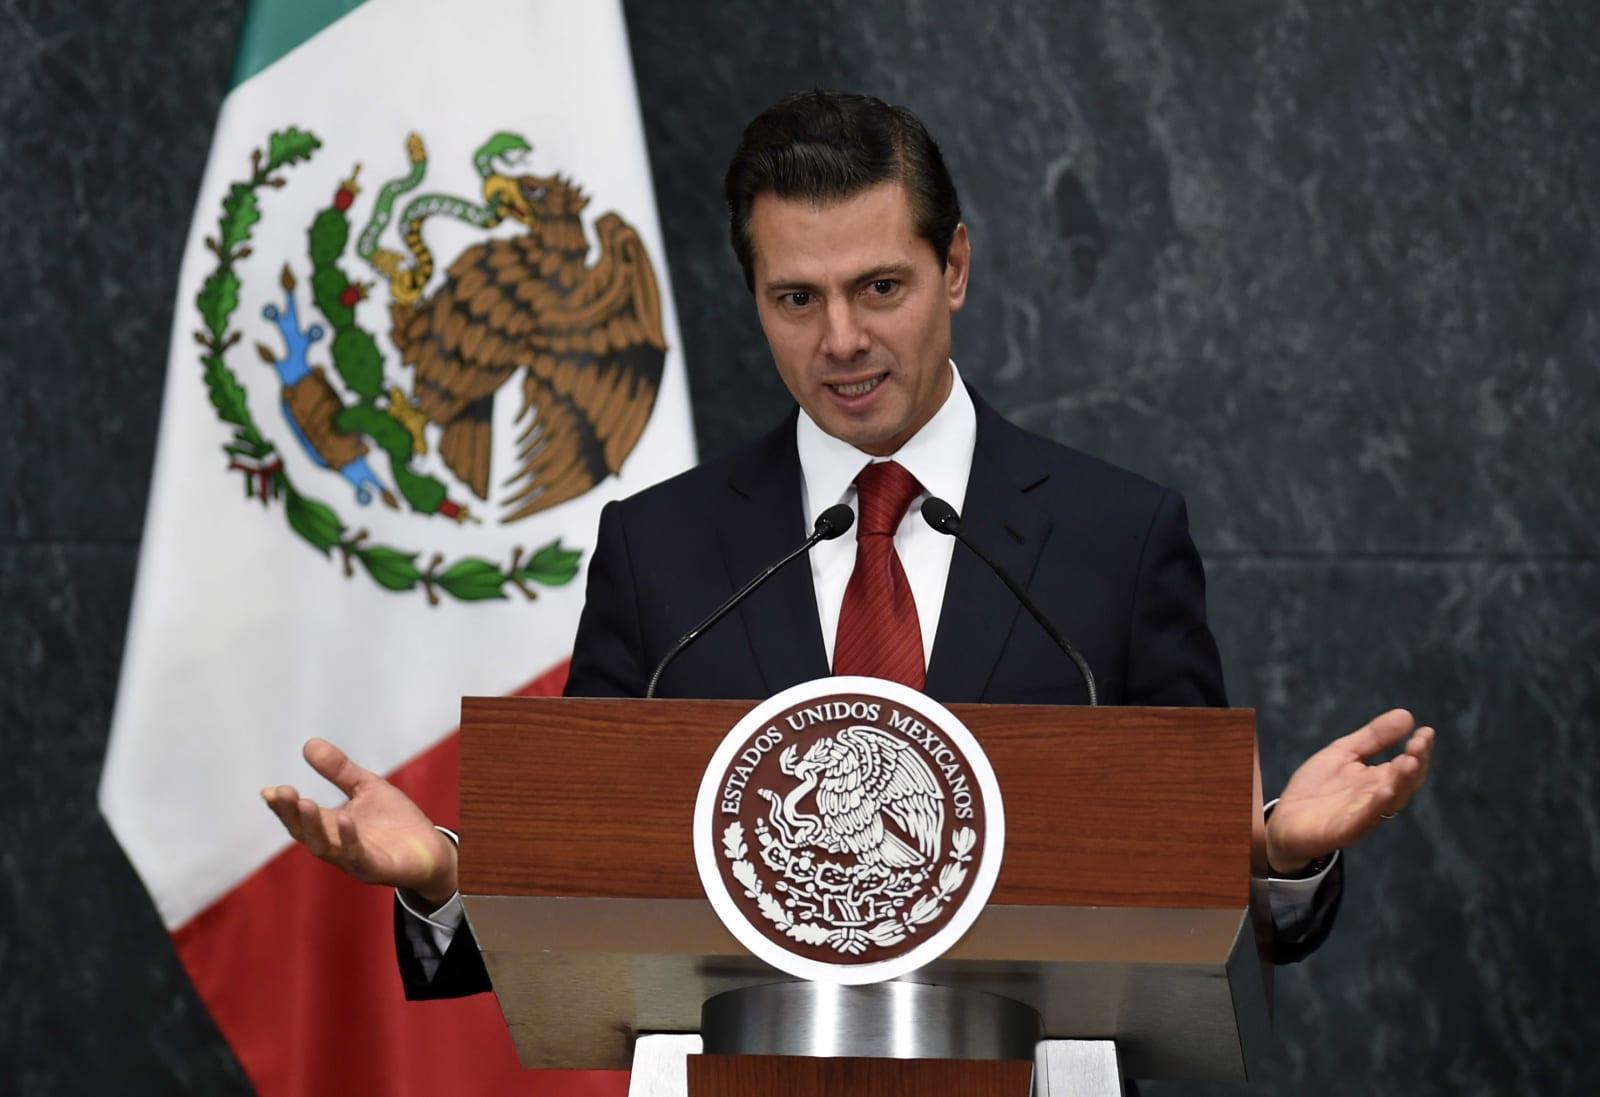 MEXICO-CABINET-EDUCATION-PENA NIETO